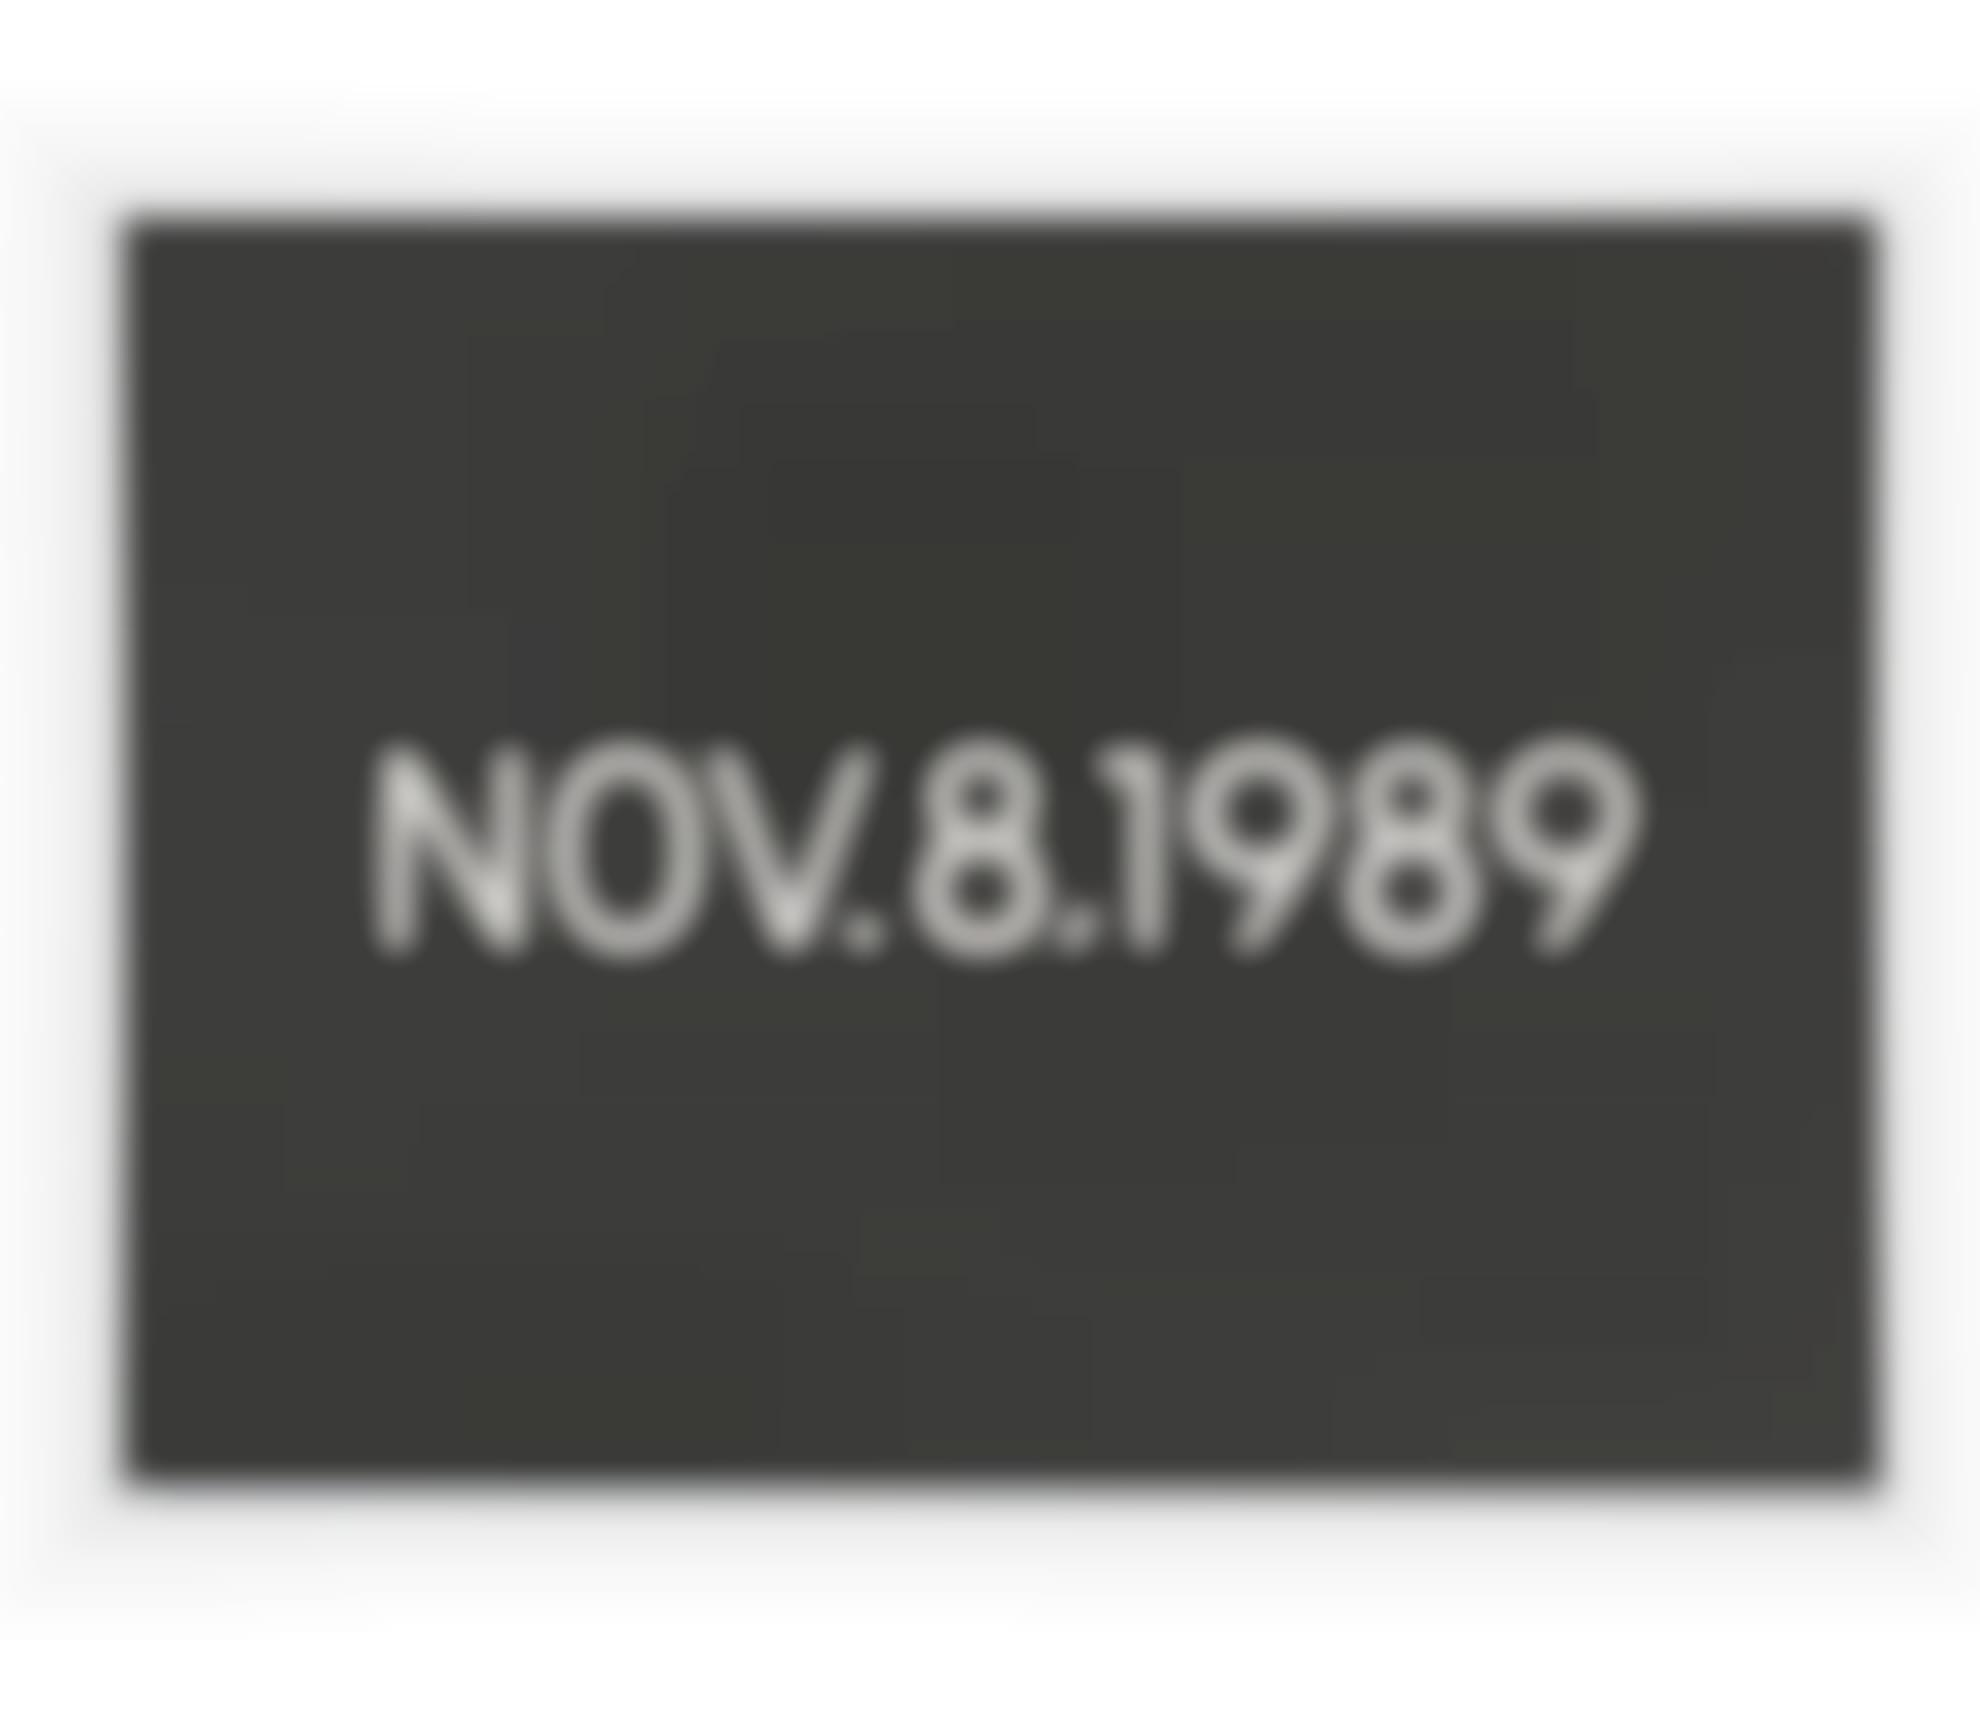 On Kawara-Nov. 8, 1989-